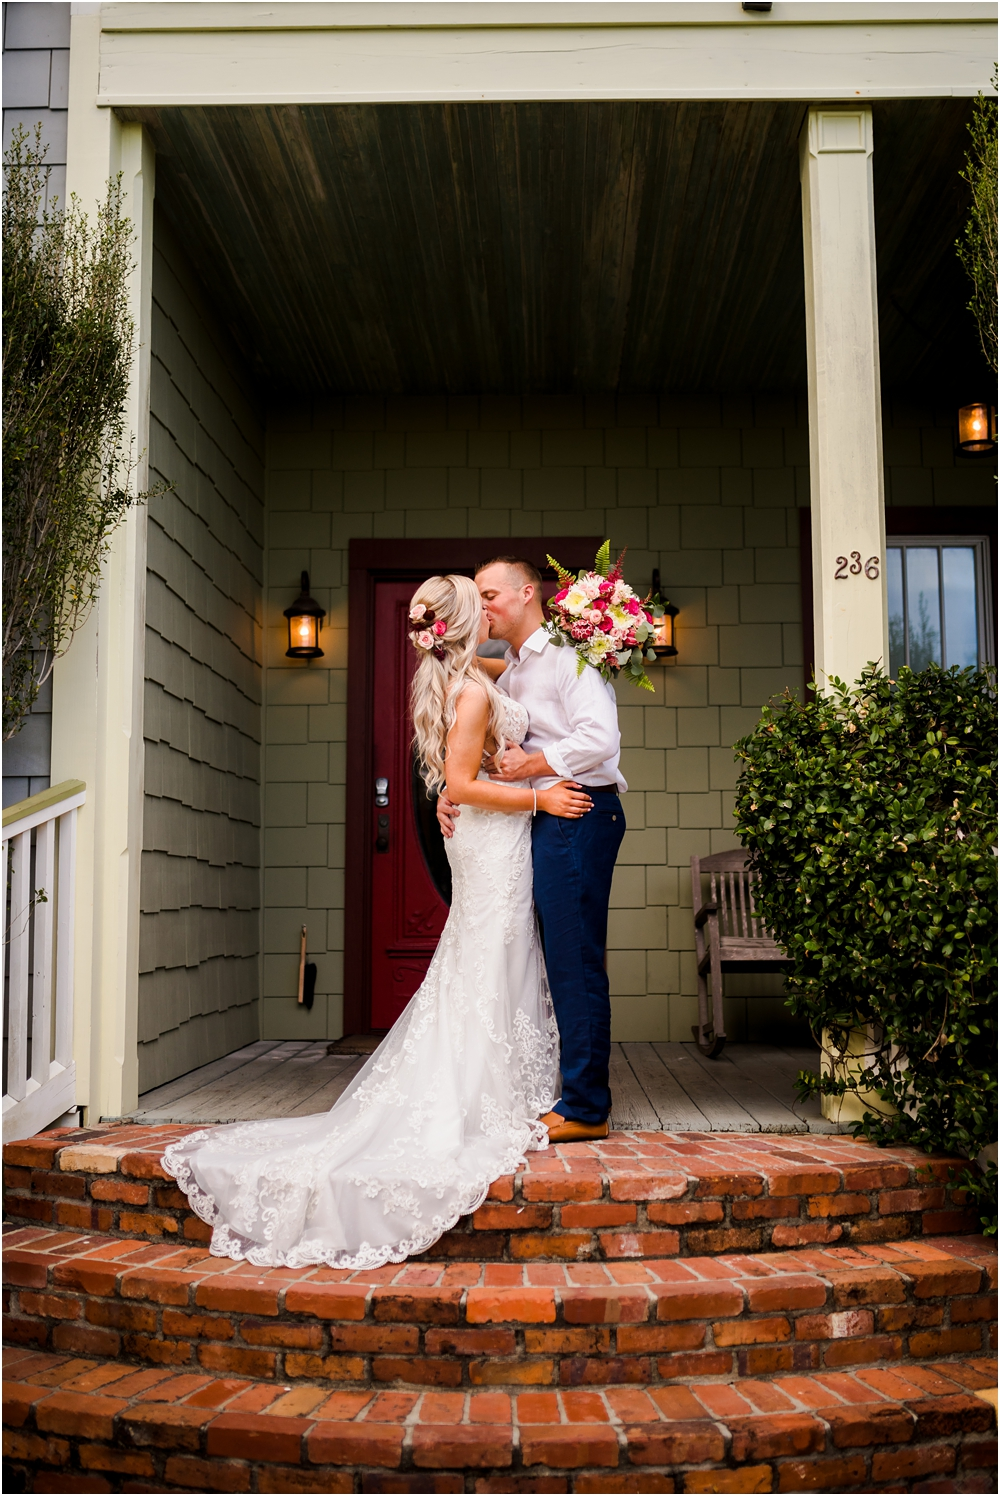 mcglothlin-wedding-kiersten-stevenson-photography-30a-panama-city-beach-dothan-tallahassee-(56-of-145).jpg